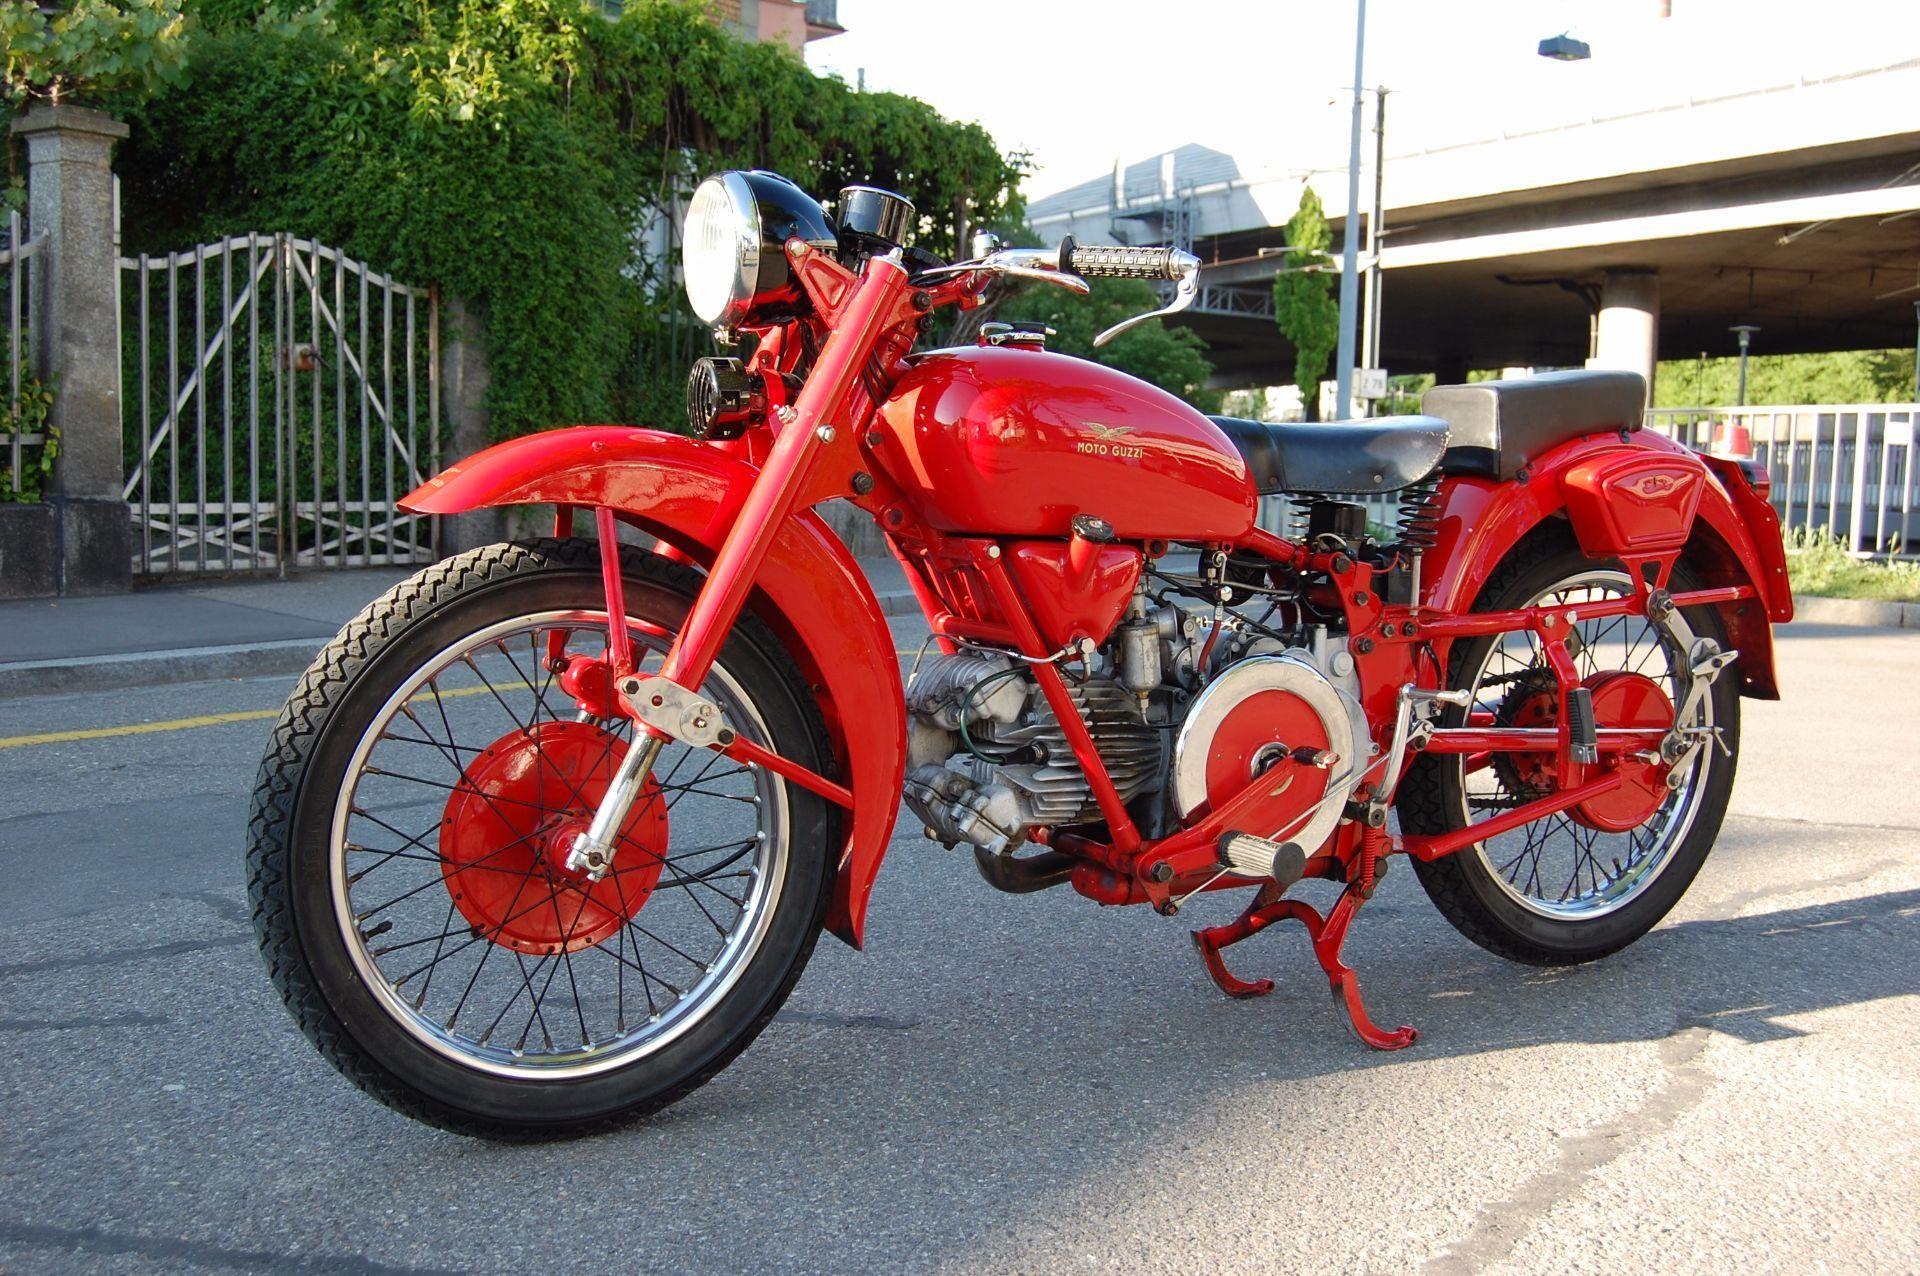 moto guzzi falcone 500 bosshard motos adliswil oldtimer. Black Bedroom Furniture Sets. Home Design Ideas